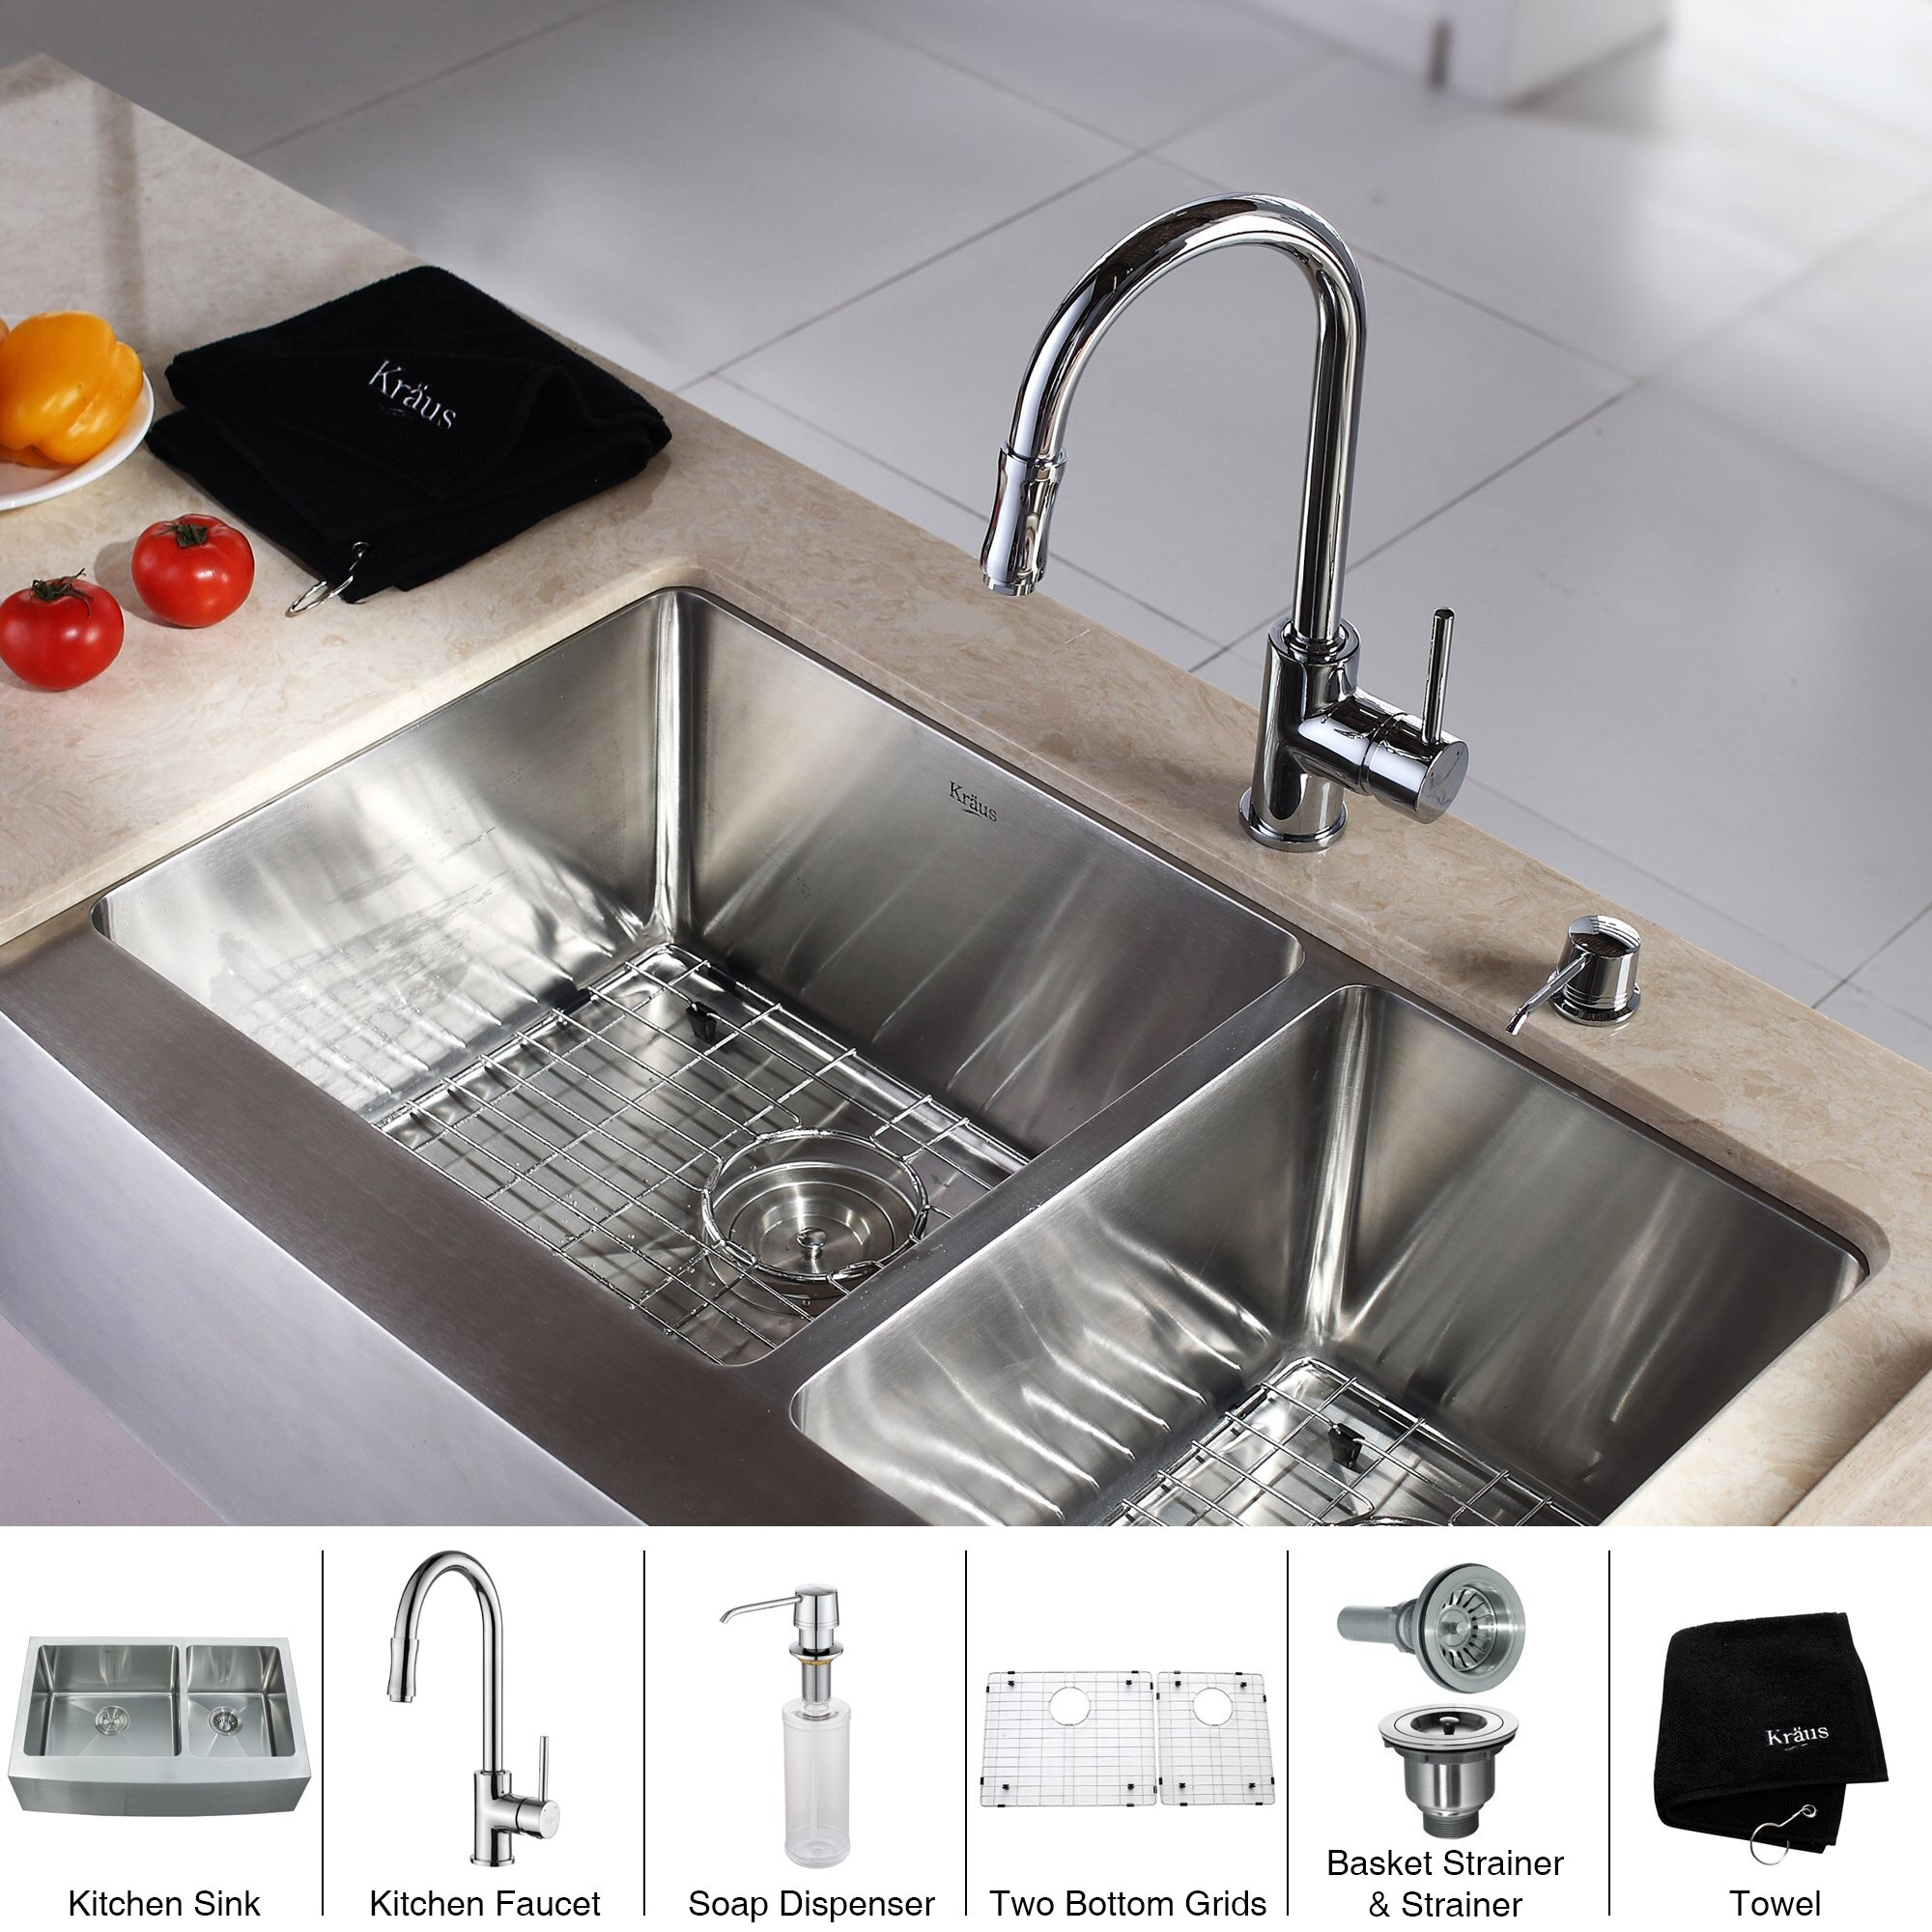 Kraus x double bowl farmhouse kitchen sink for Best kitchen faucet for double sink